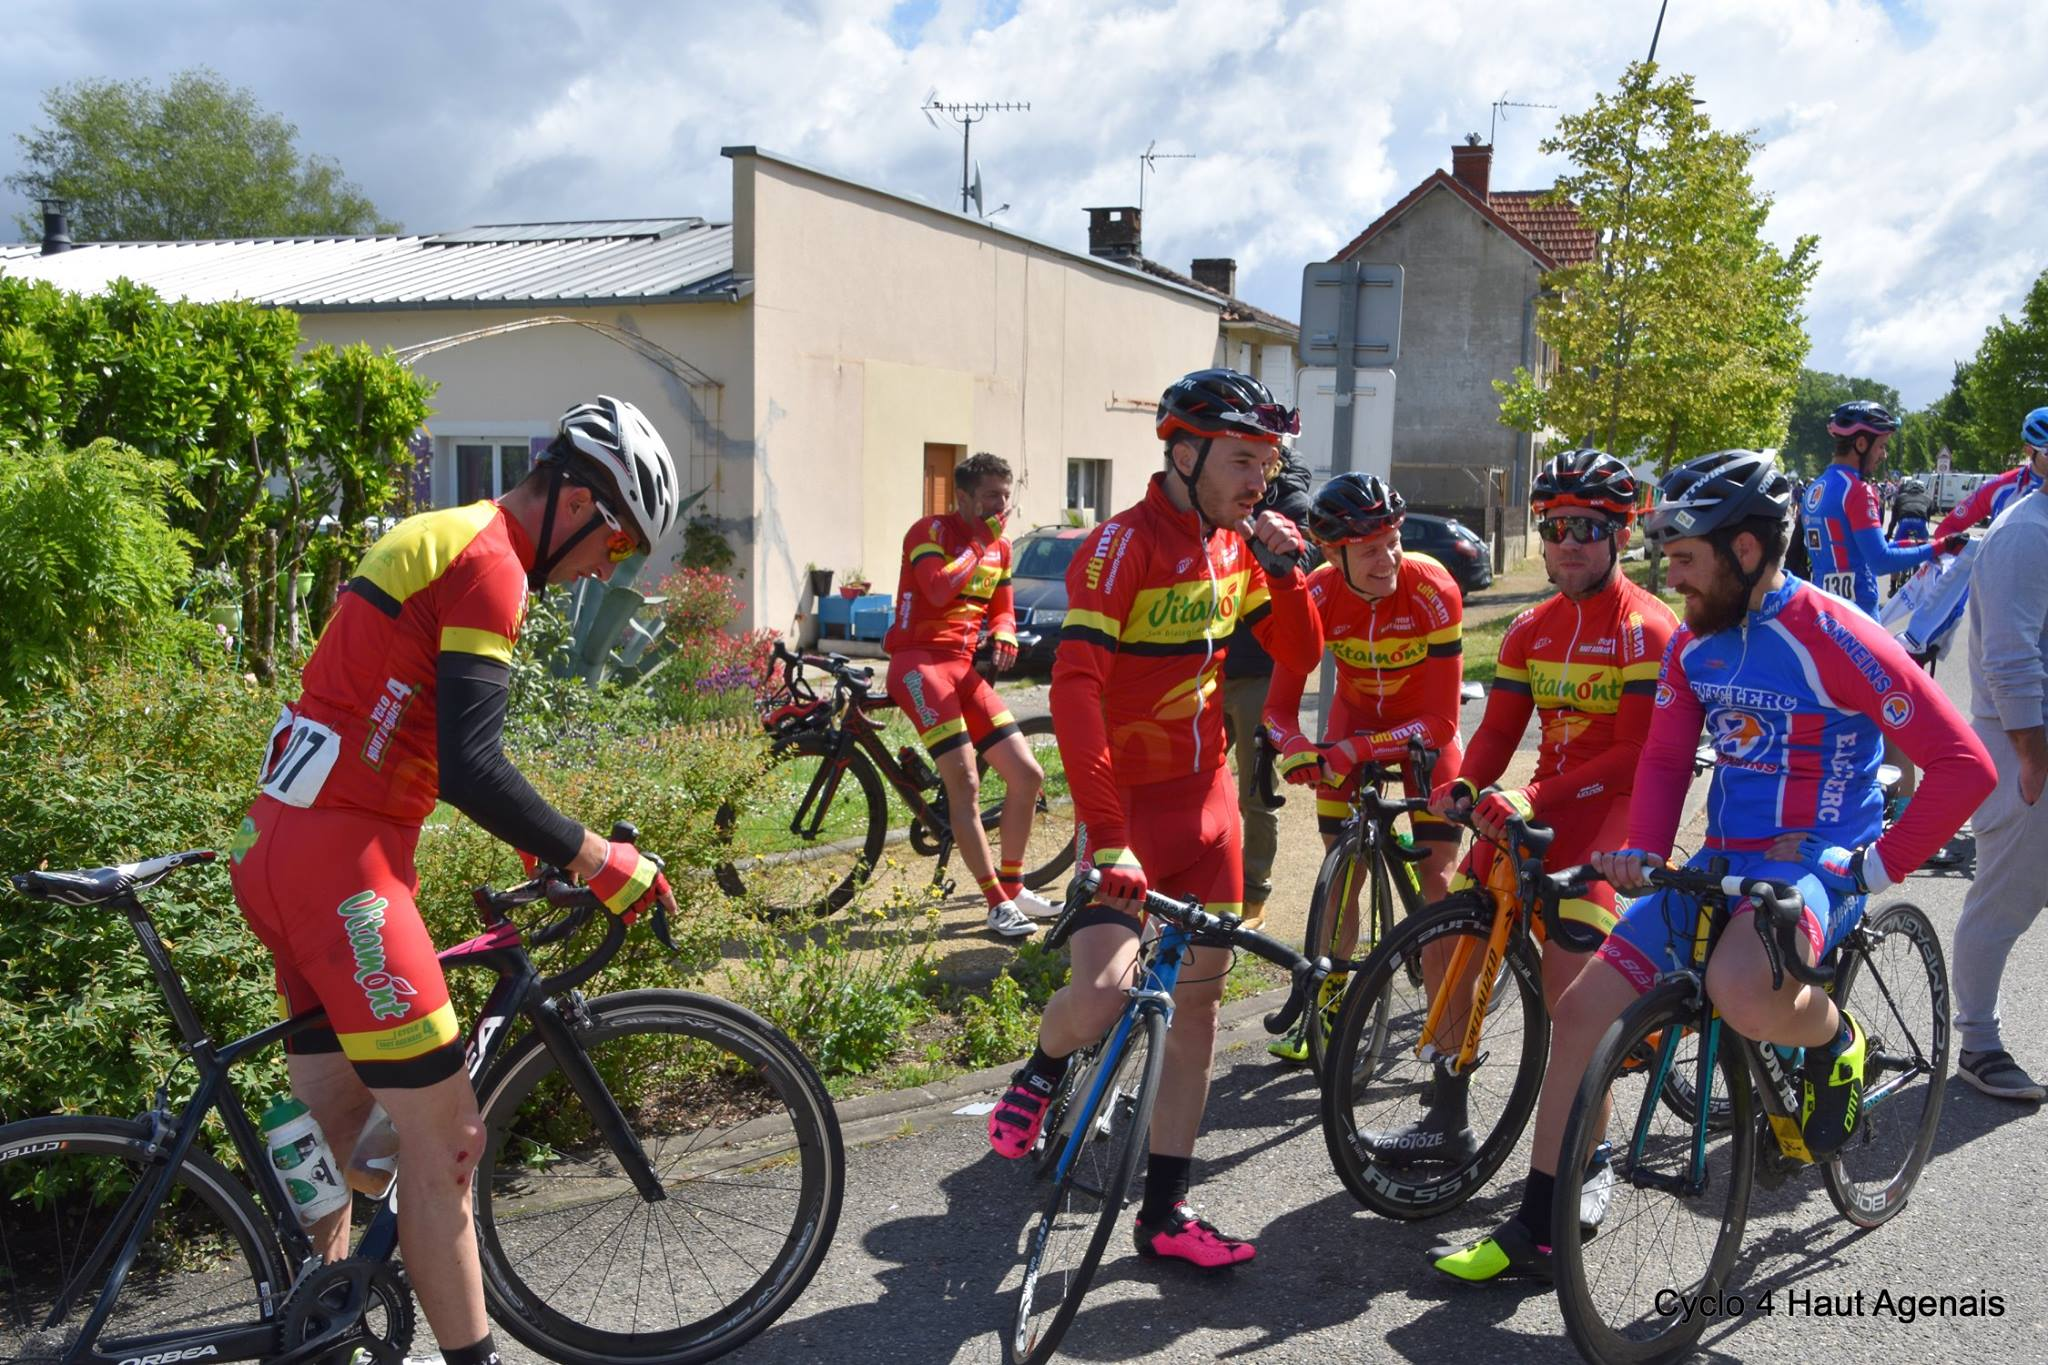 2018-05-13-Tour Chalosse-19.jpg